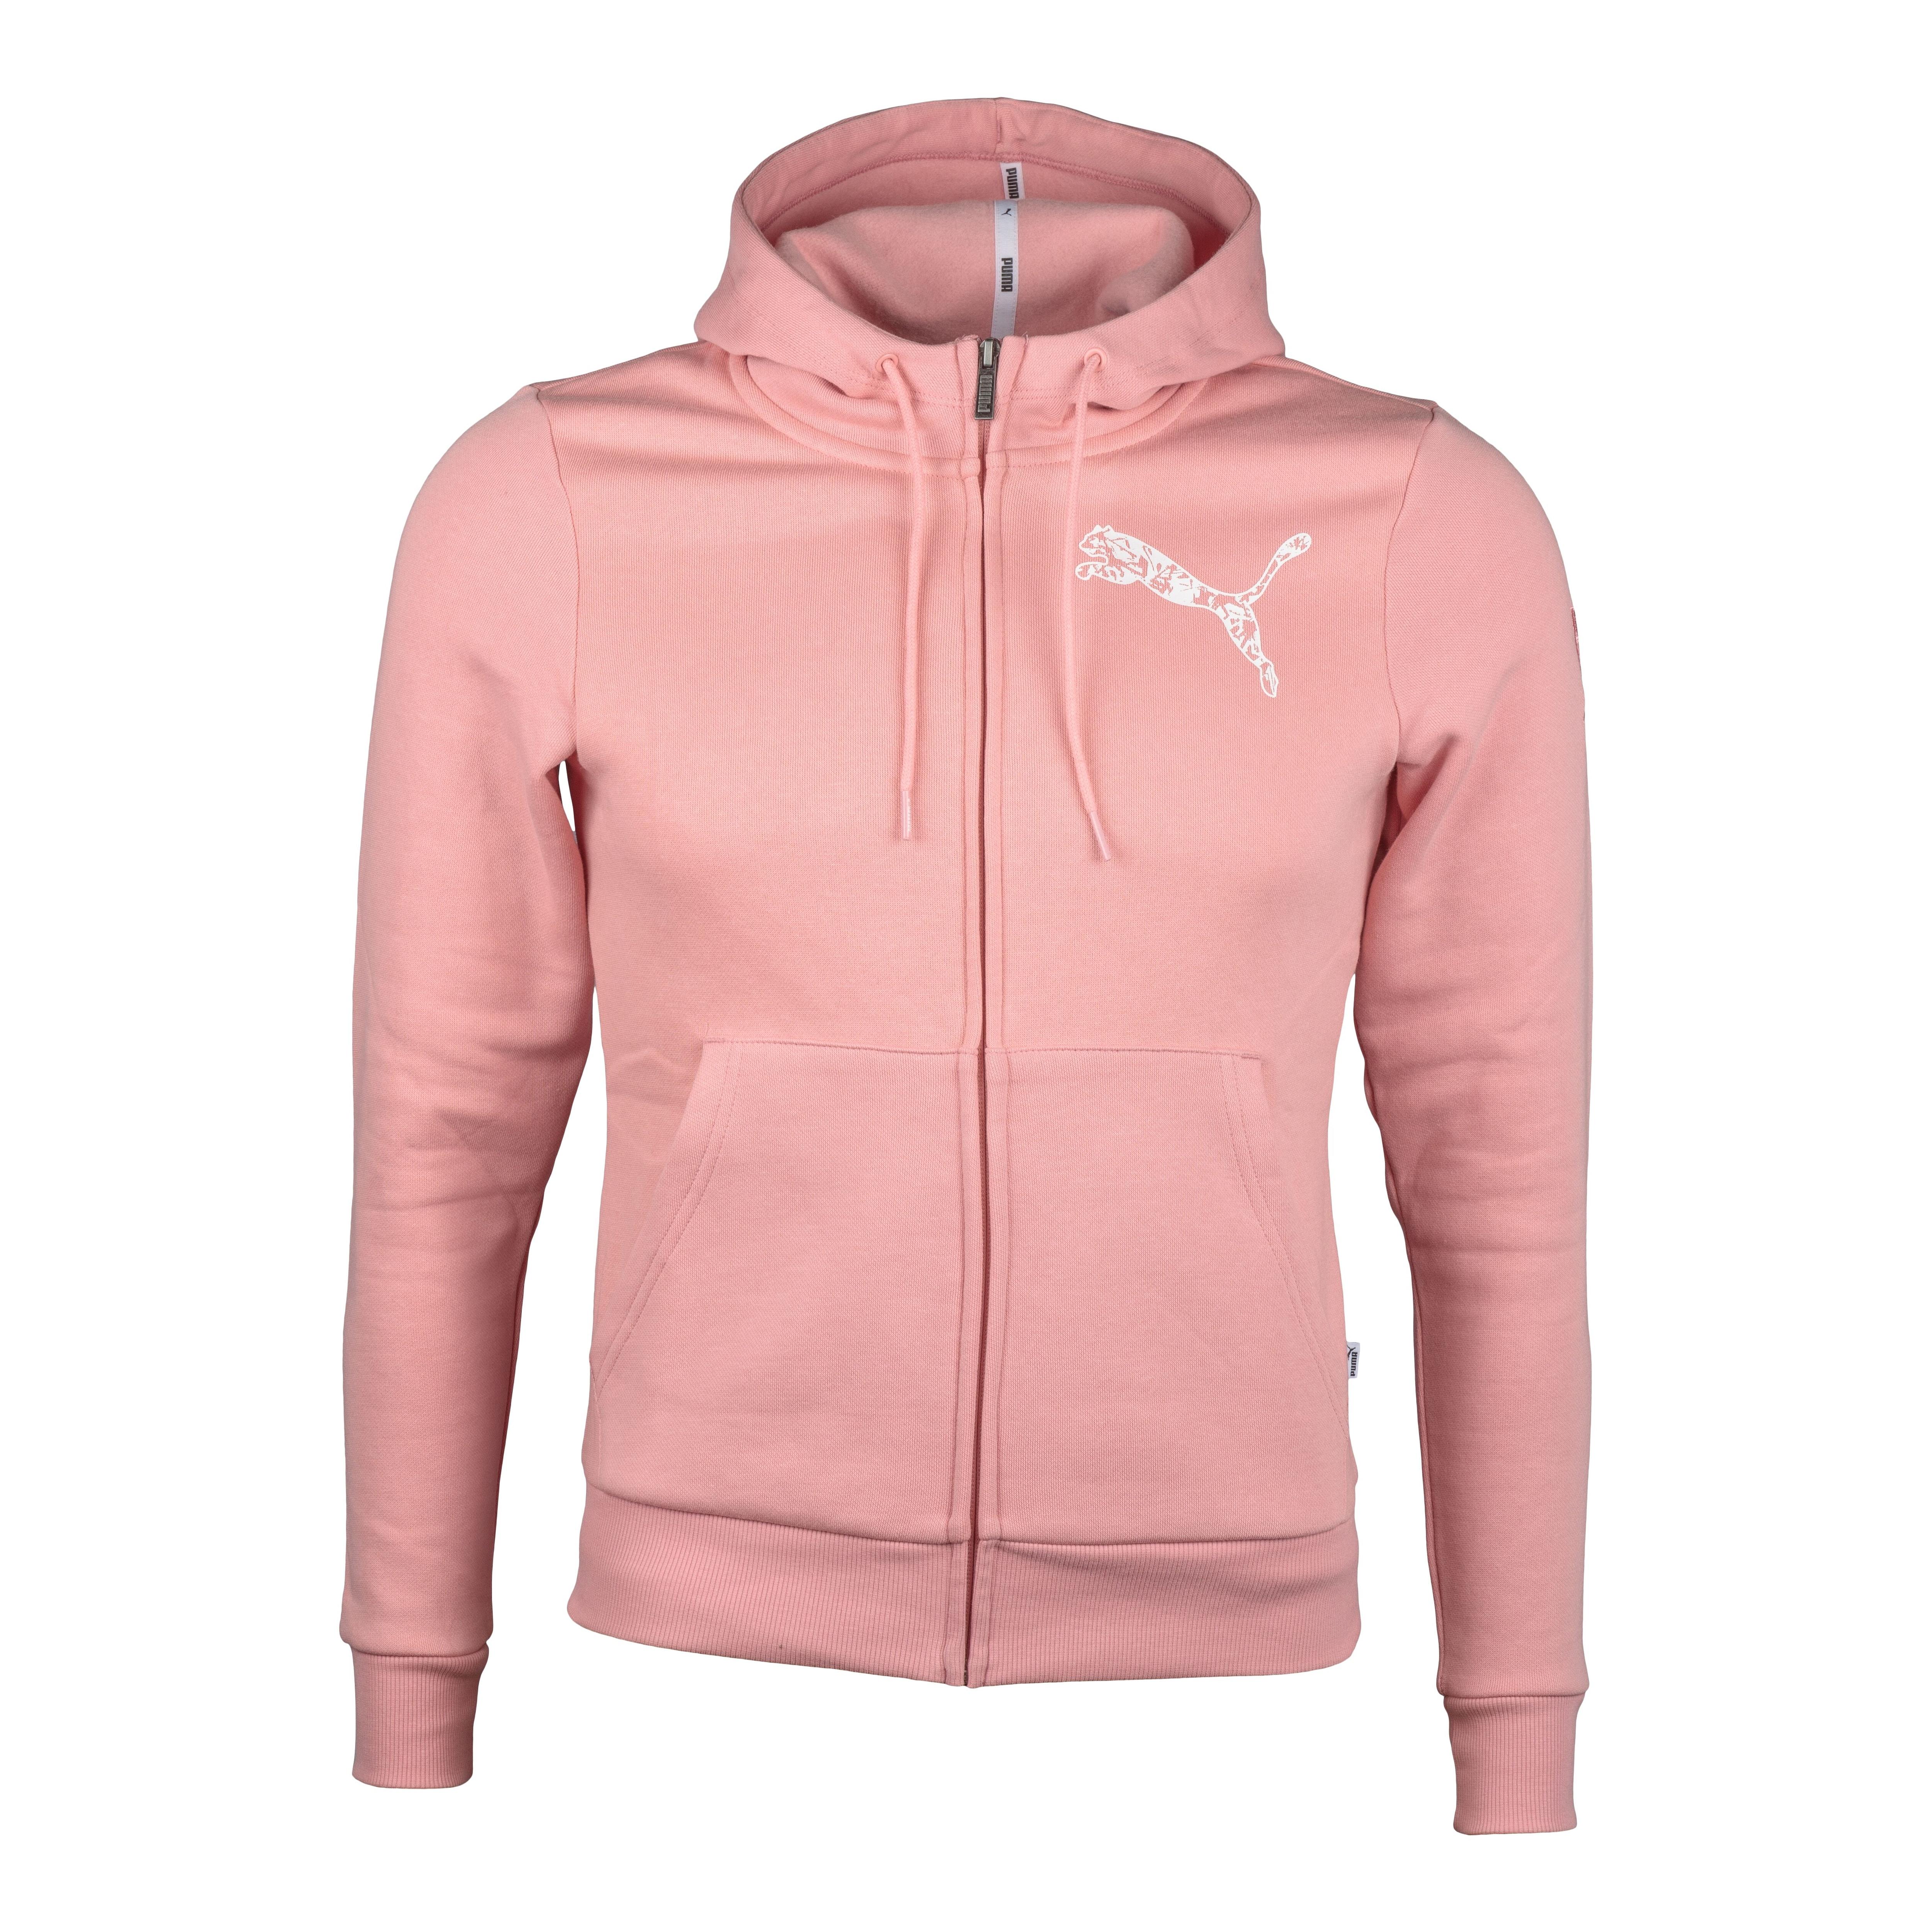 Puma dam ziphood rosa